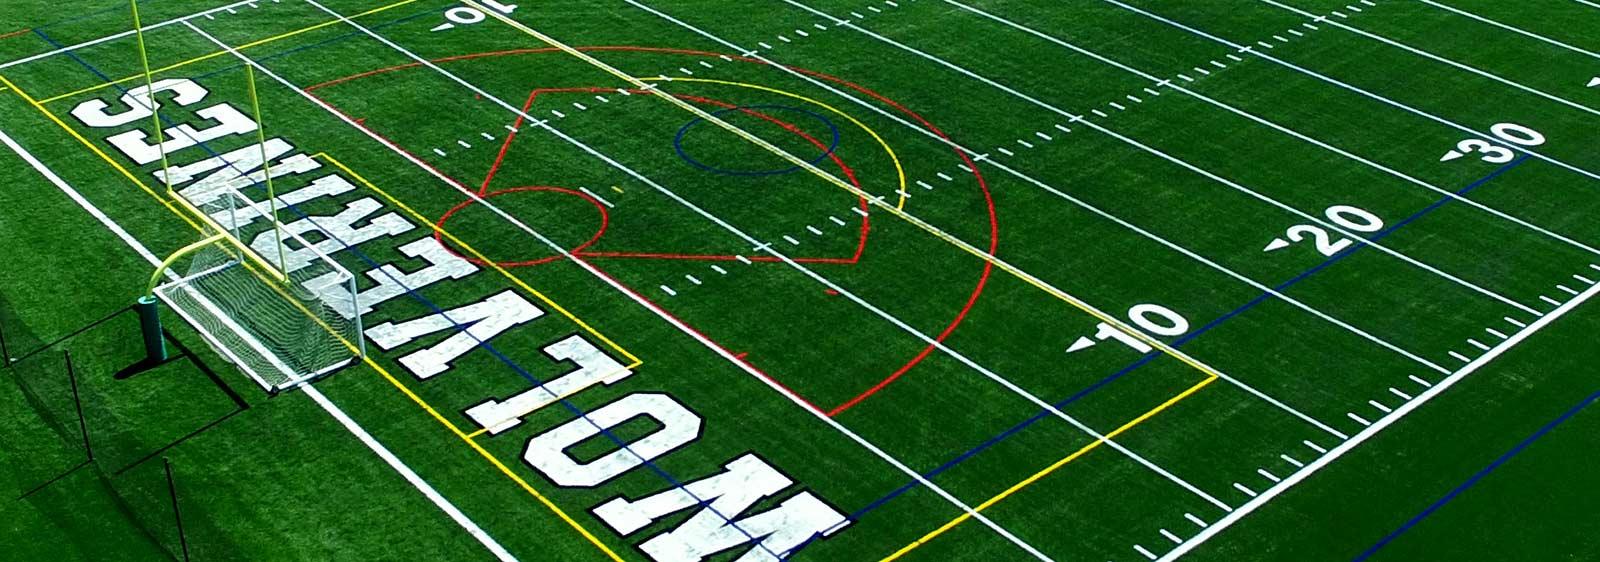 Wolverines Stadium Turf